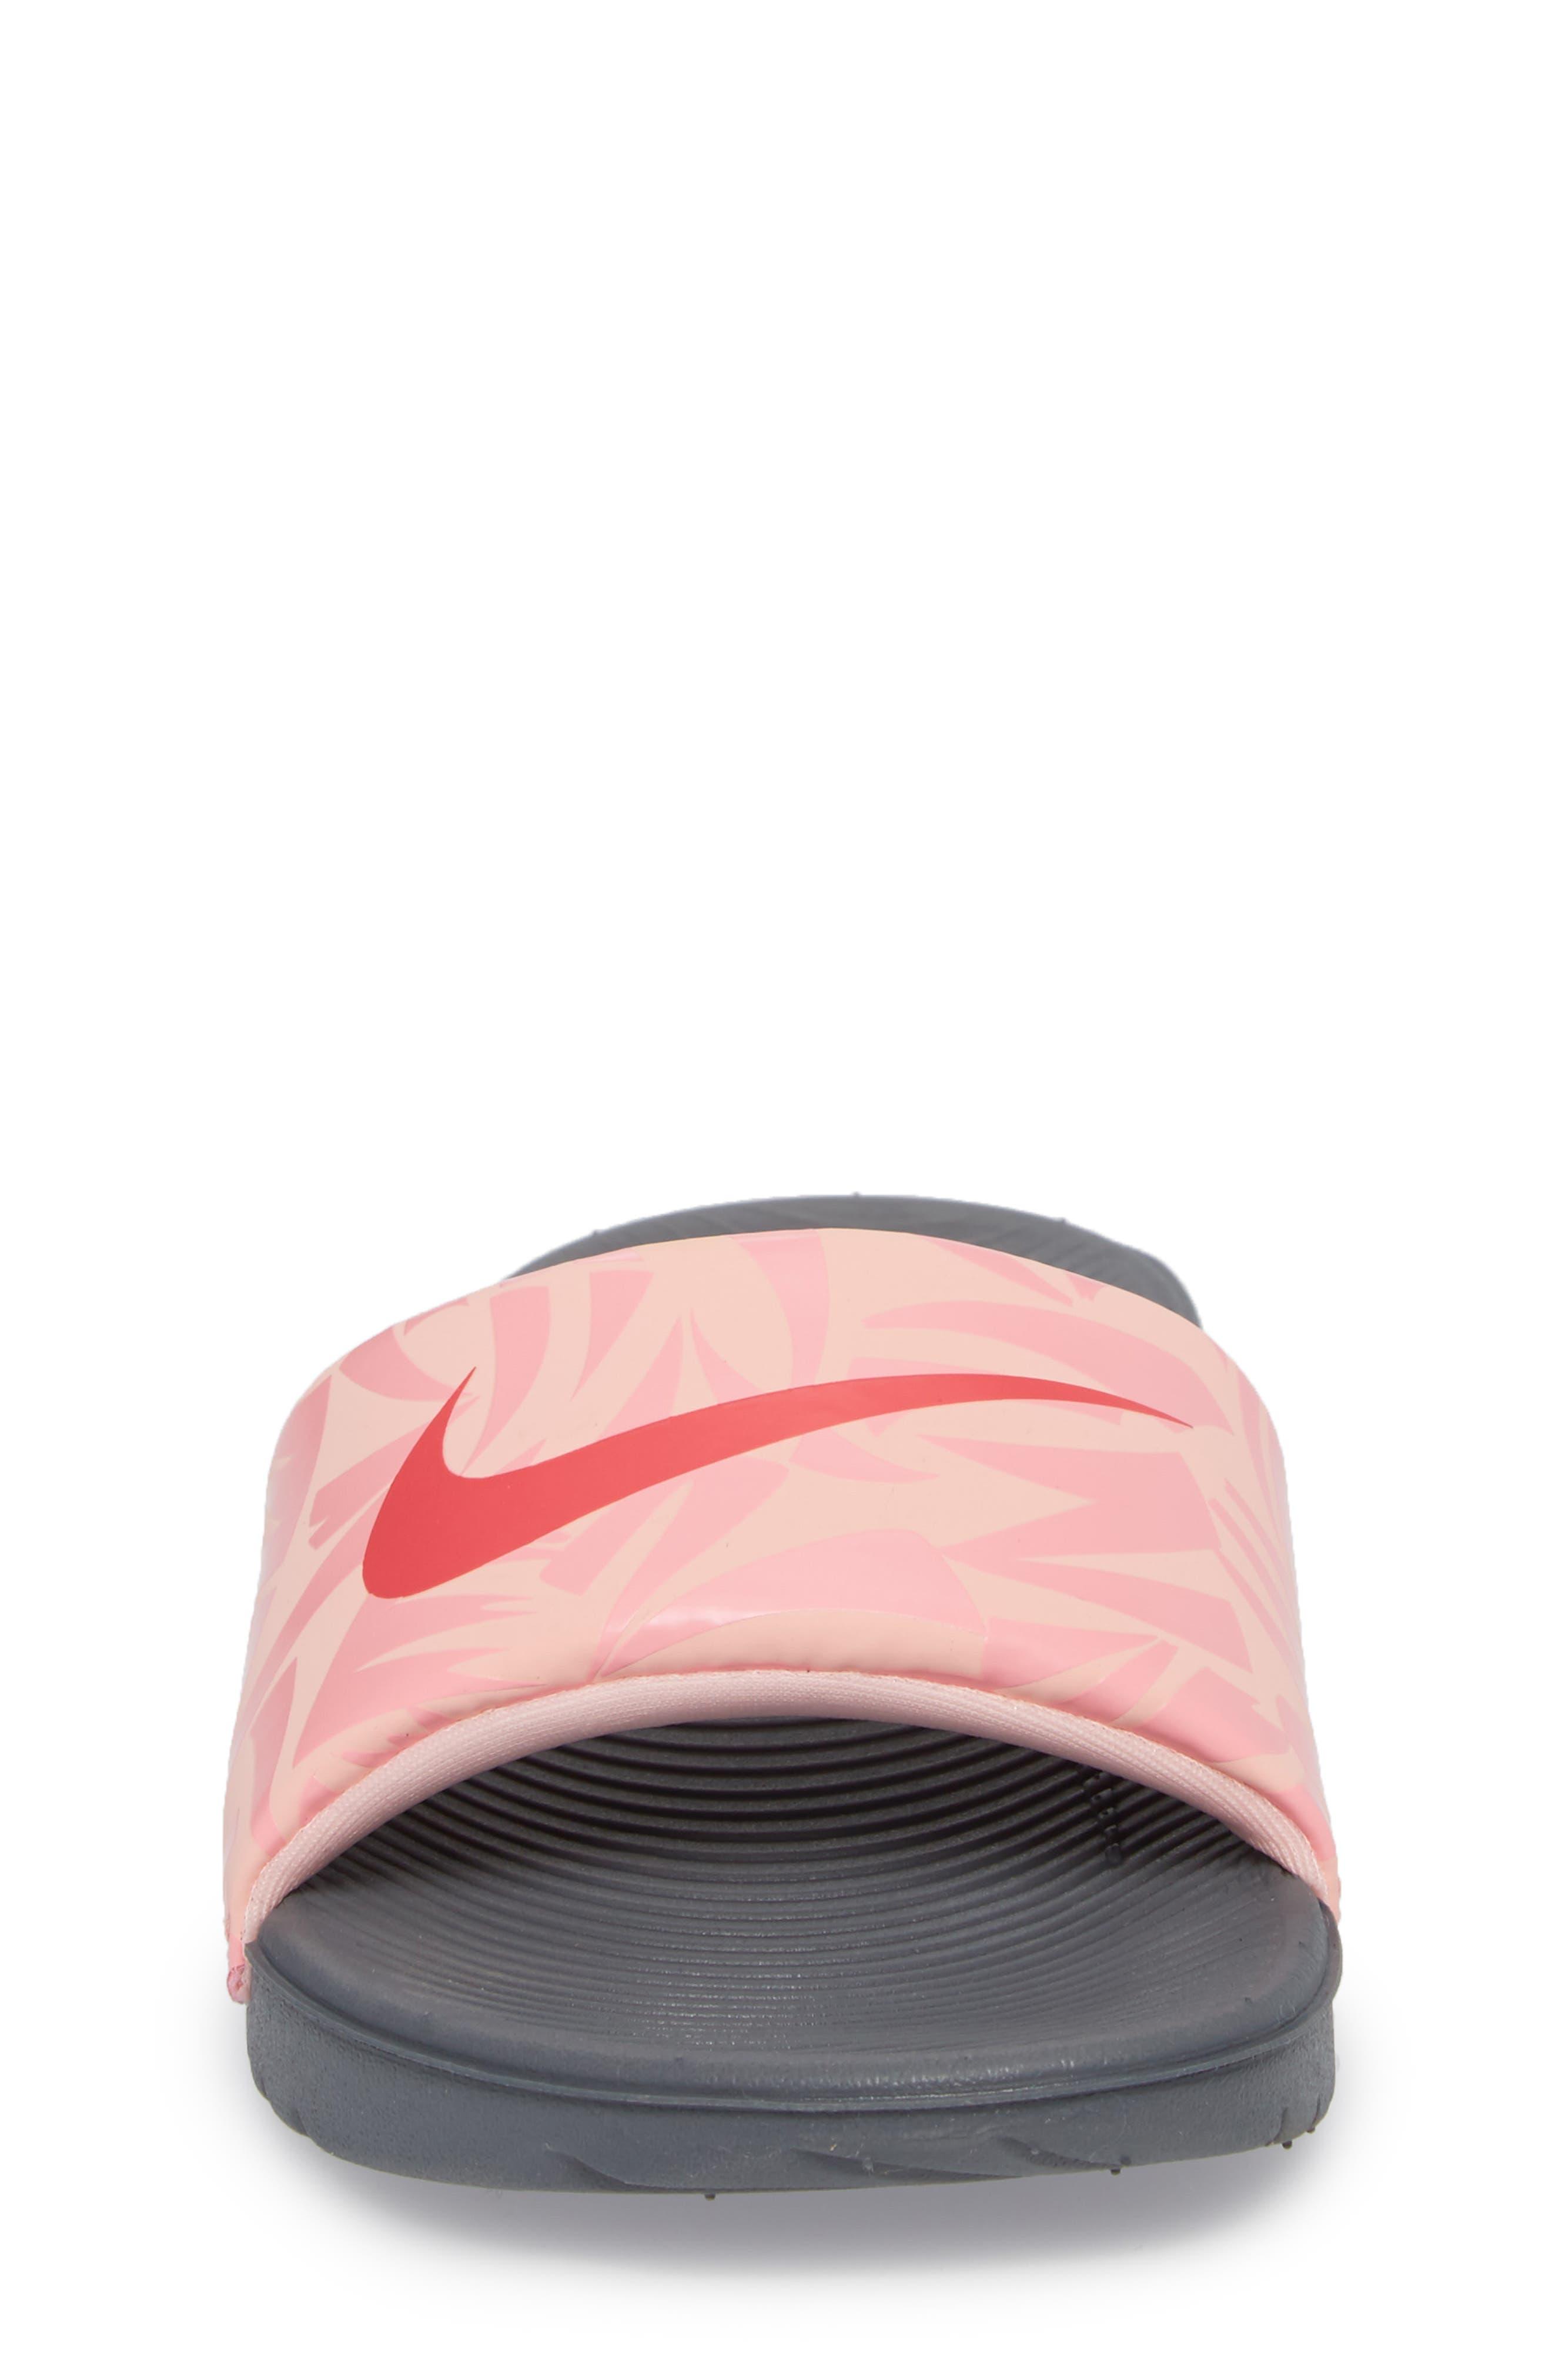 'Kawa' Print Slide Sandal,                             Alternate thumbnail 4, color,                             Grey/ Tropical Pink/ Coral